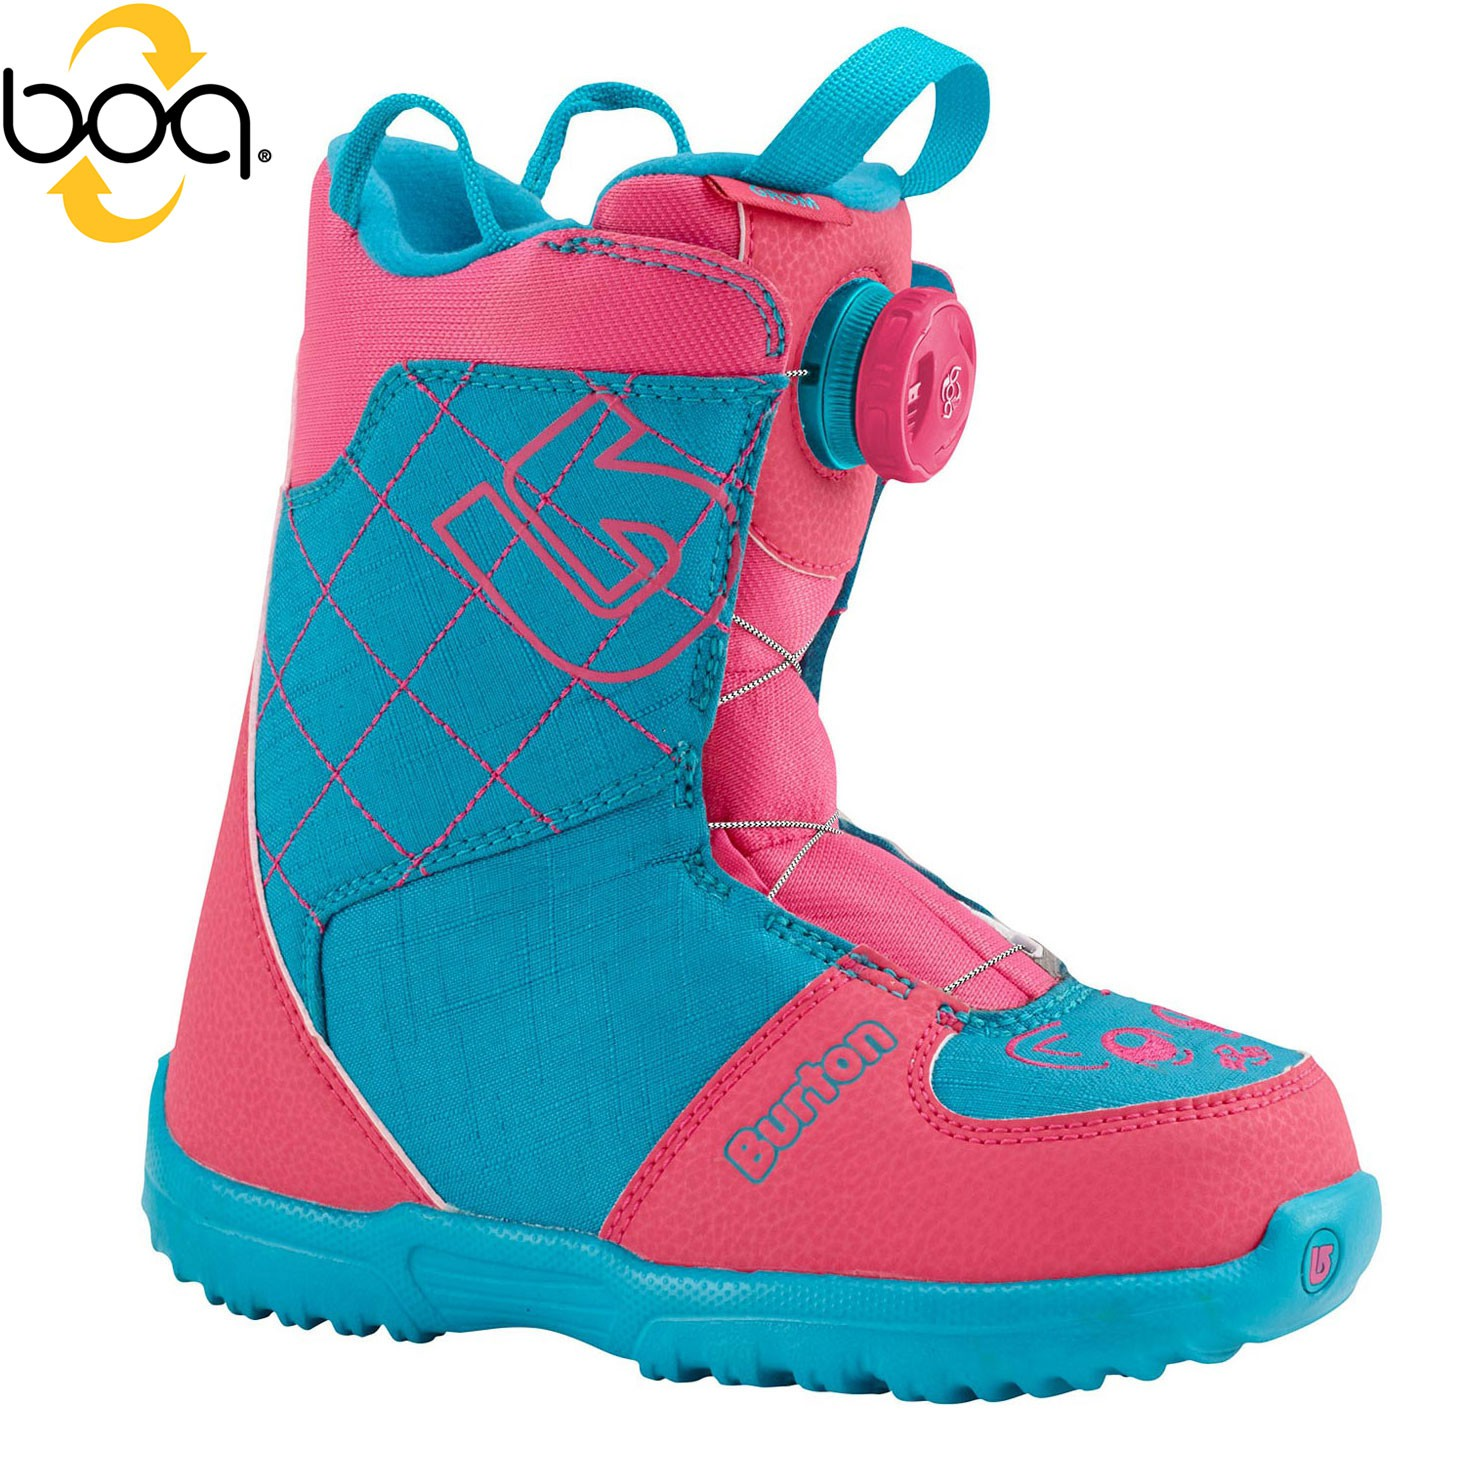 Boty Burton Grom Boa pink/teal